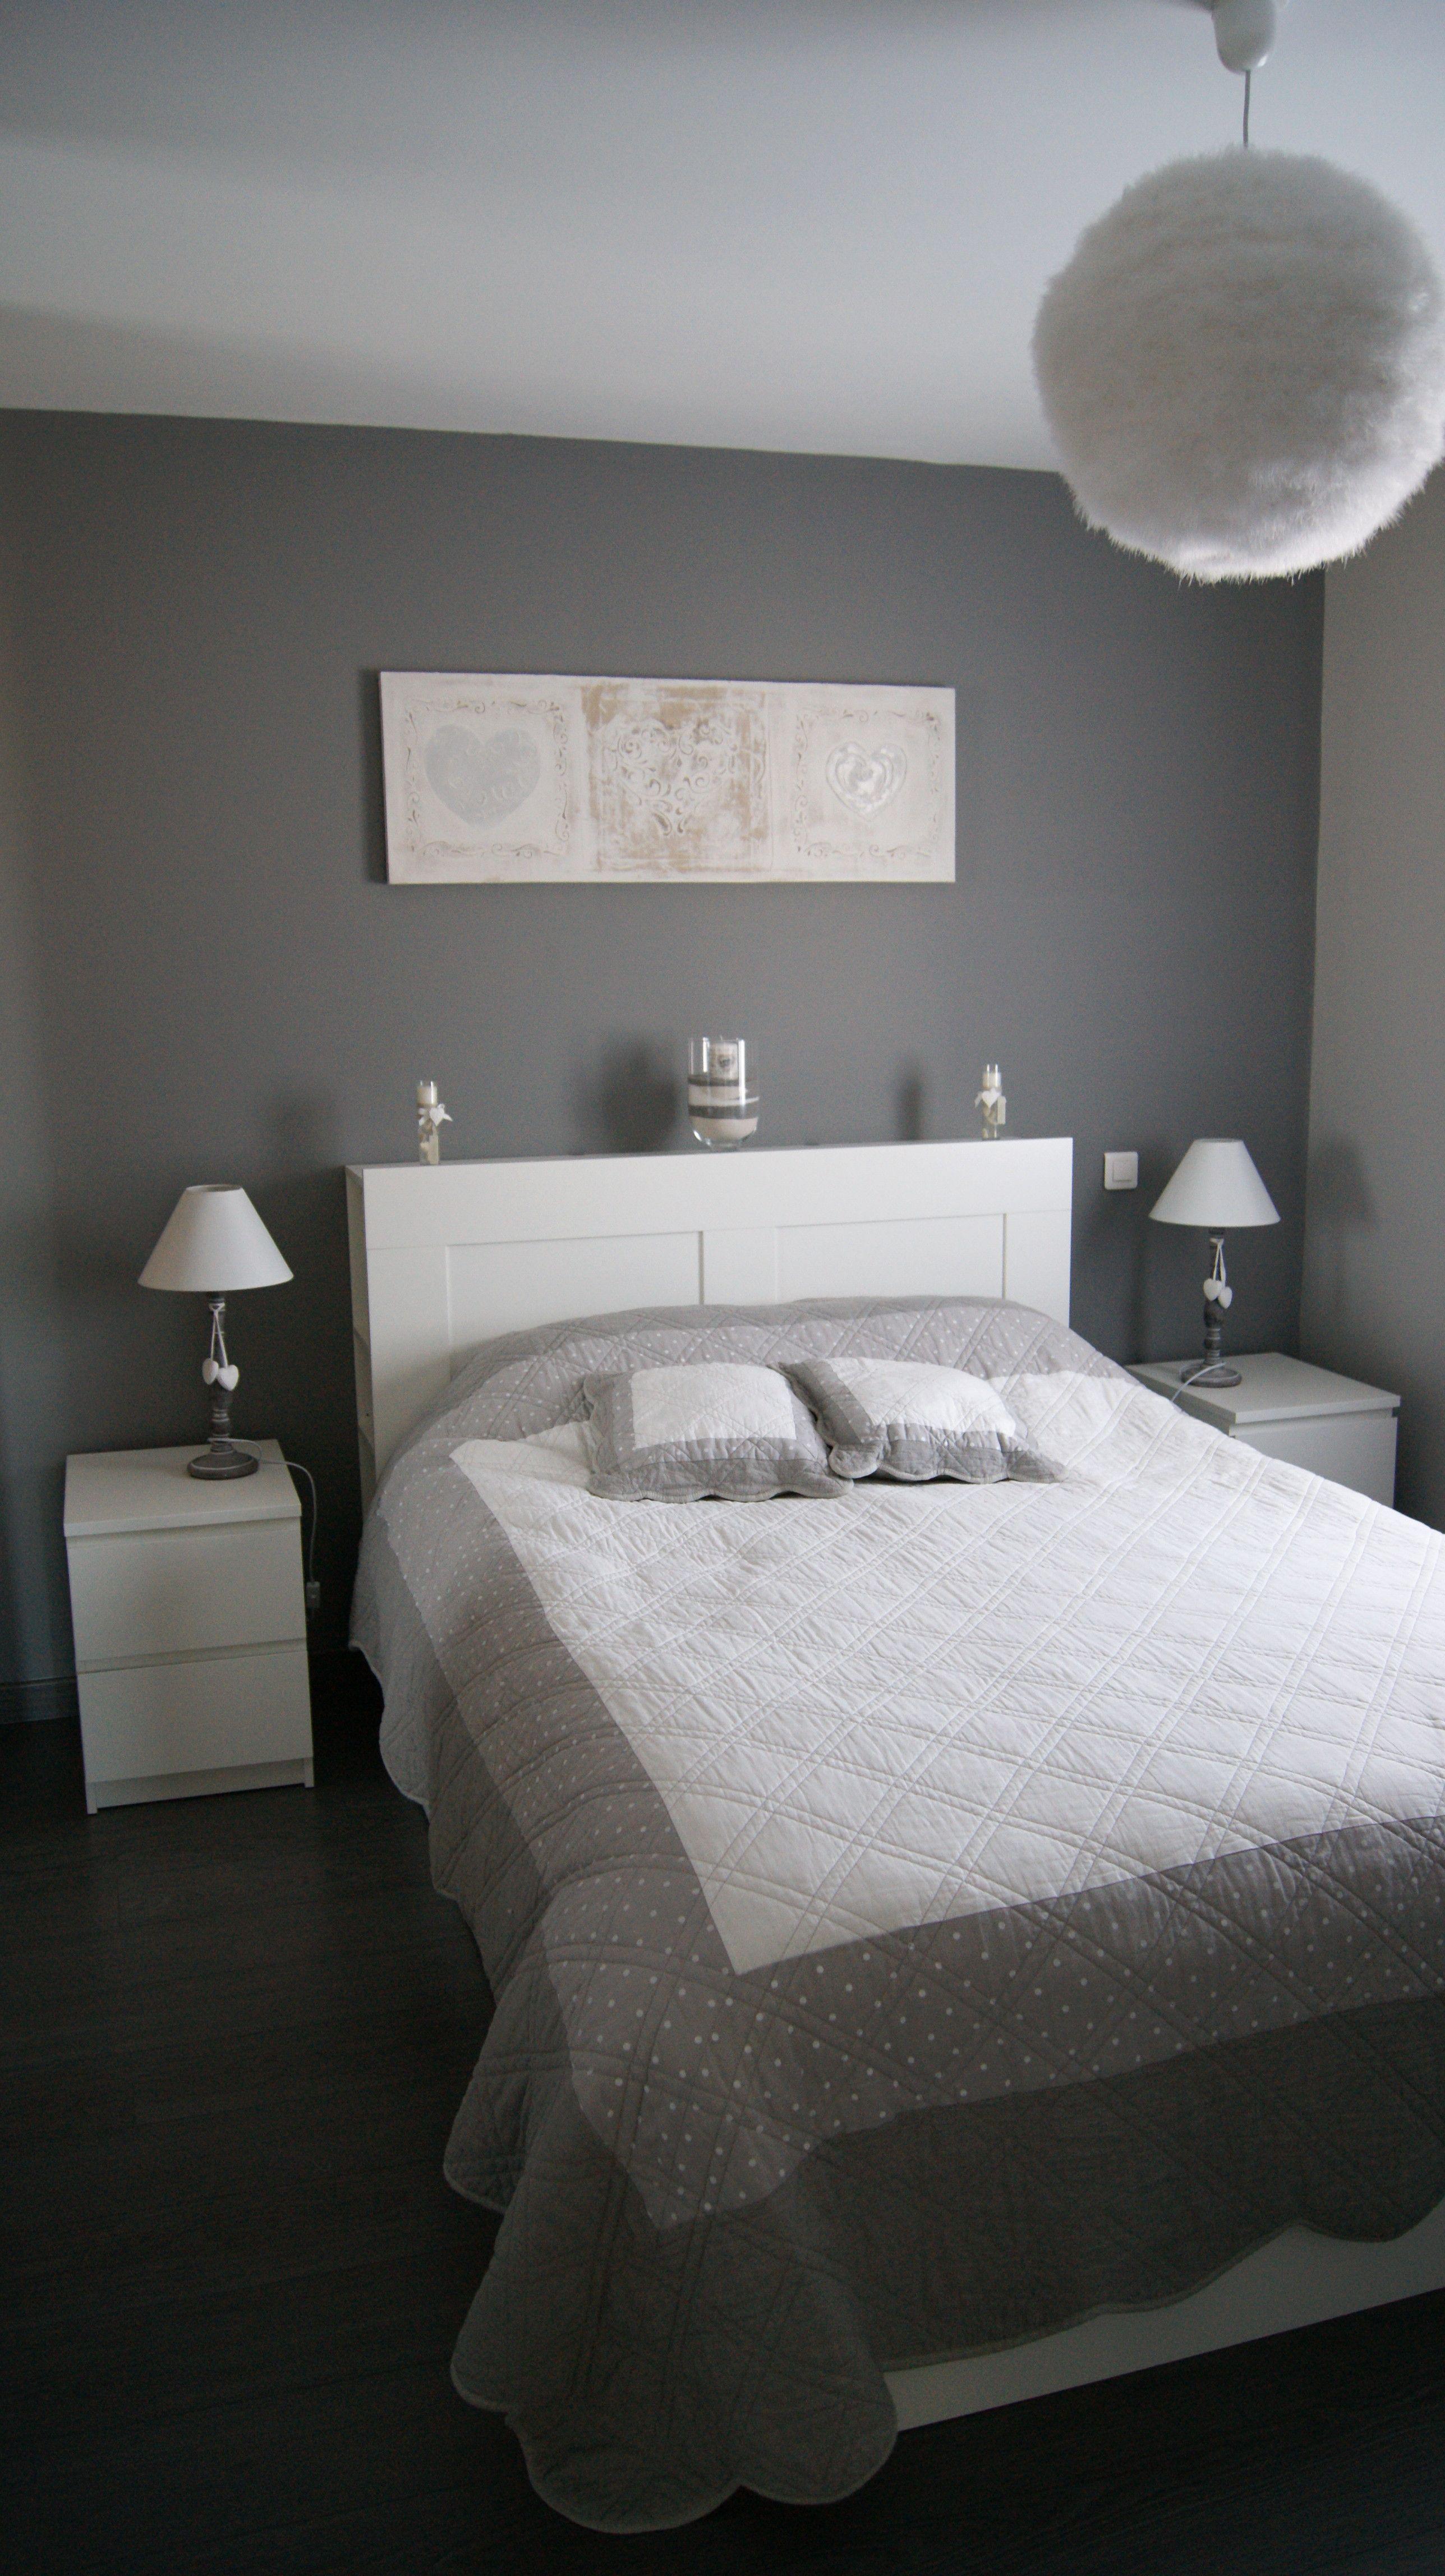 inspirational chambre parentale romantique id es de. Black Bedroom Furniture Sets. Home Design Ideas